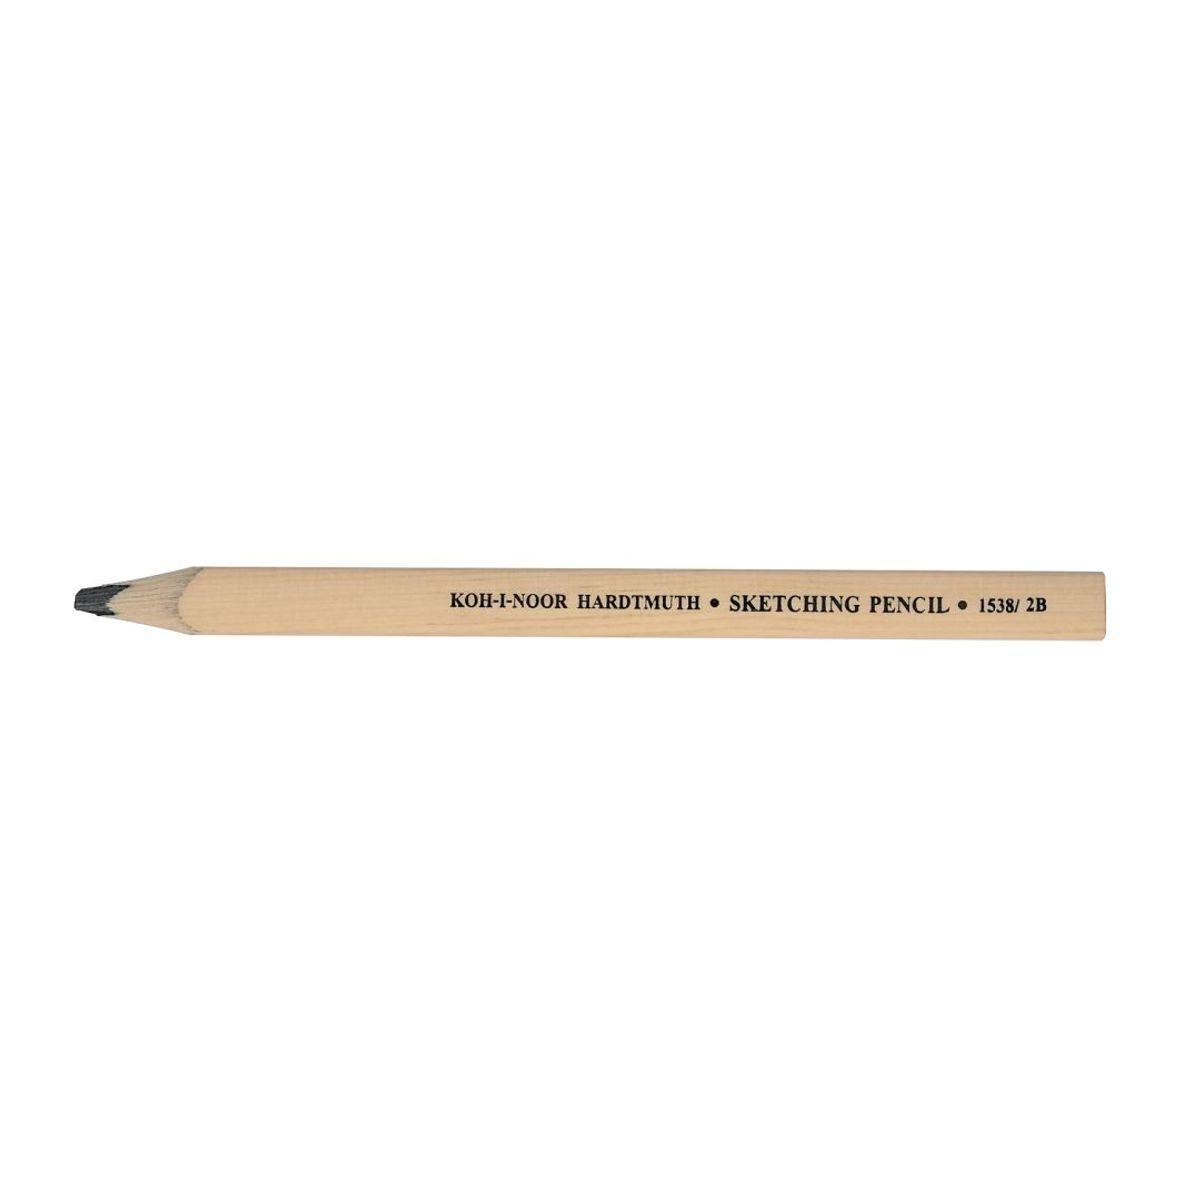 Koh I Noor Hardmuth Carpenter Flat Sketching Pencil 2b